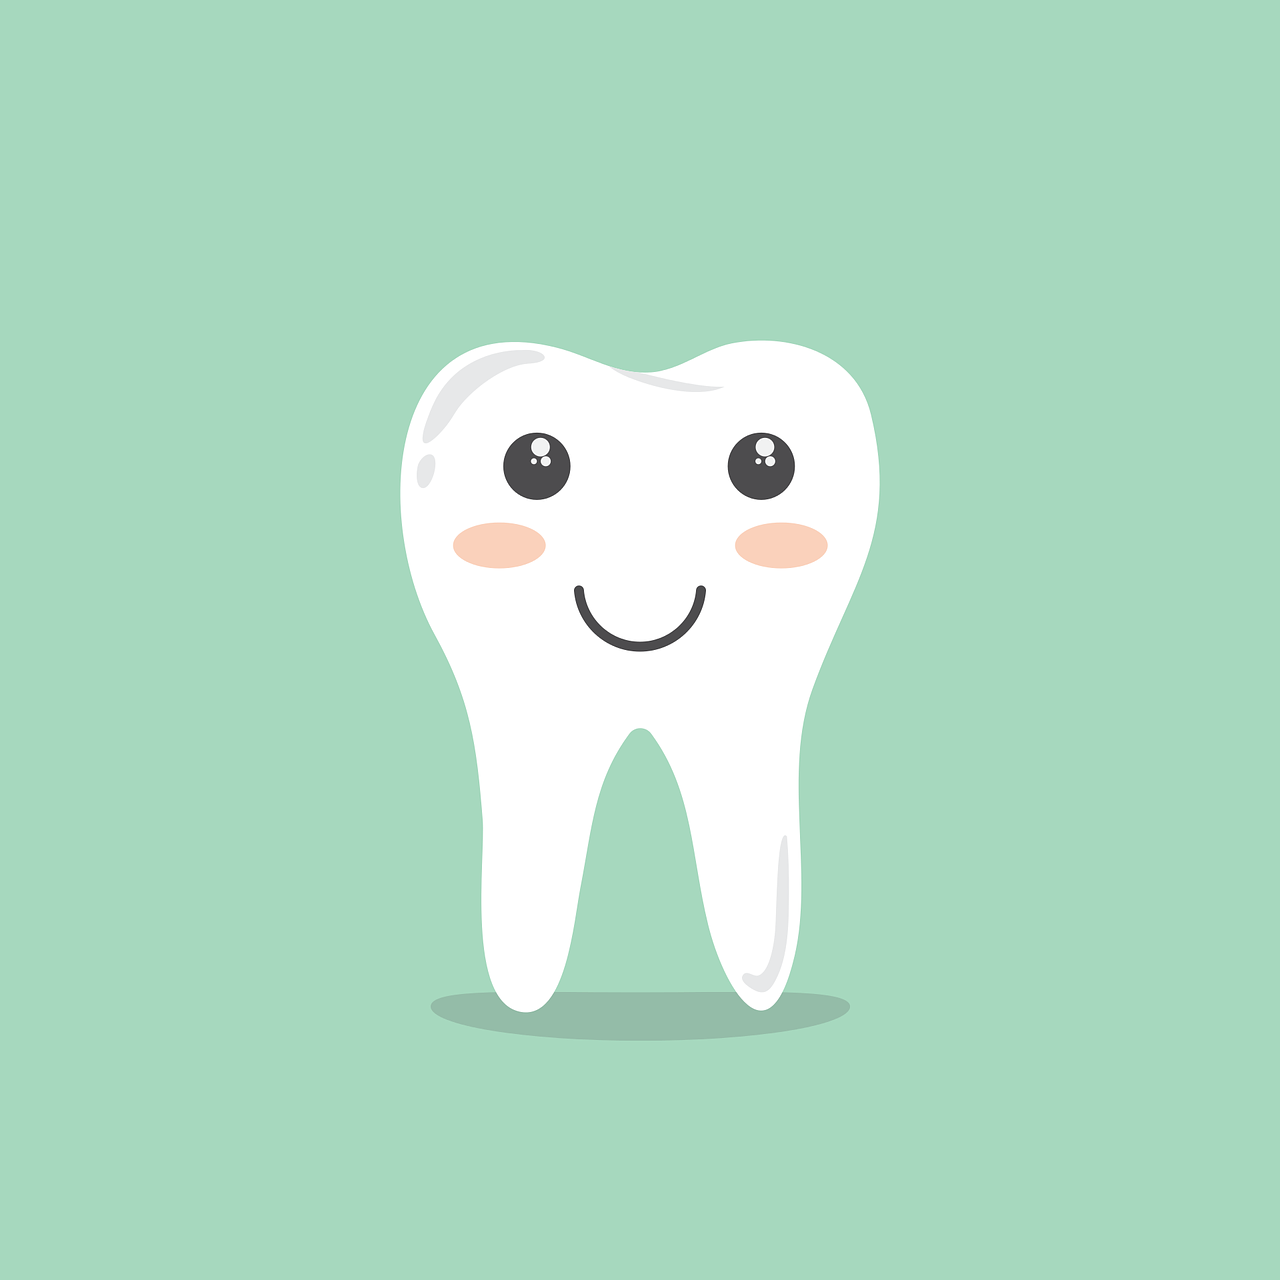 Zehn Irrtümer über Zahnpflege